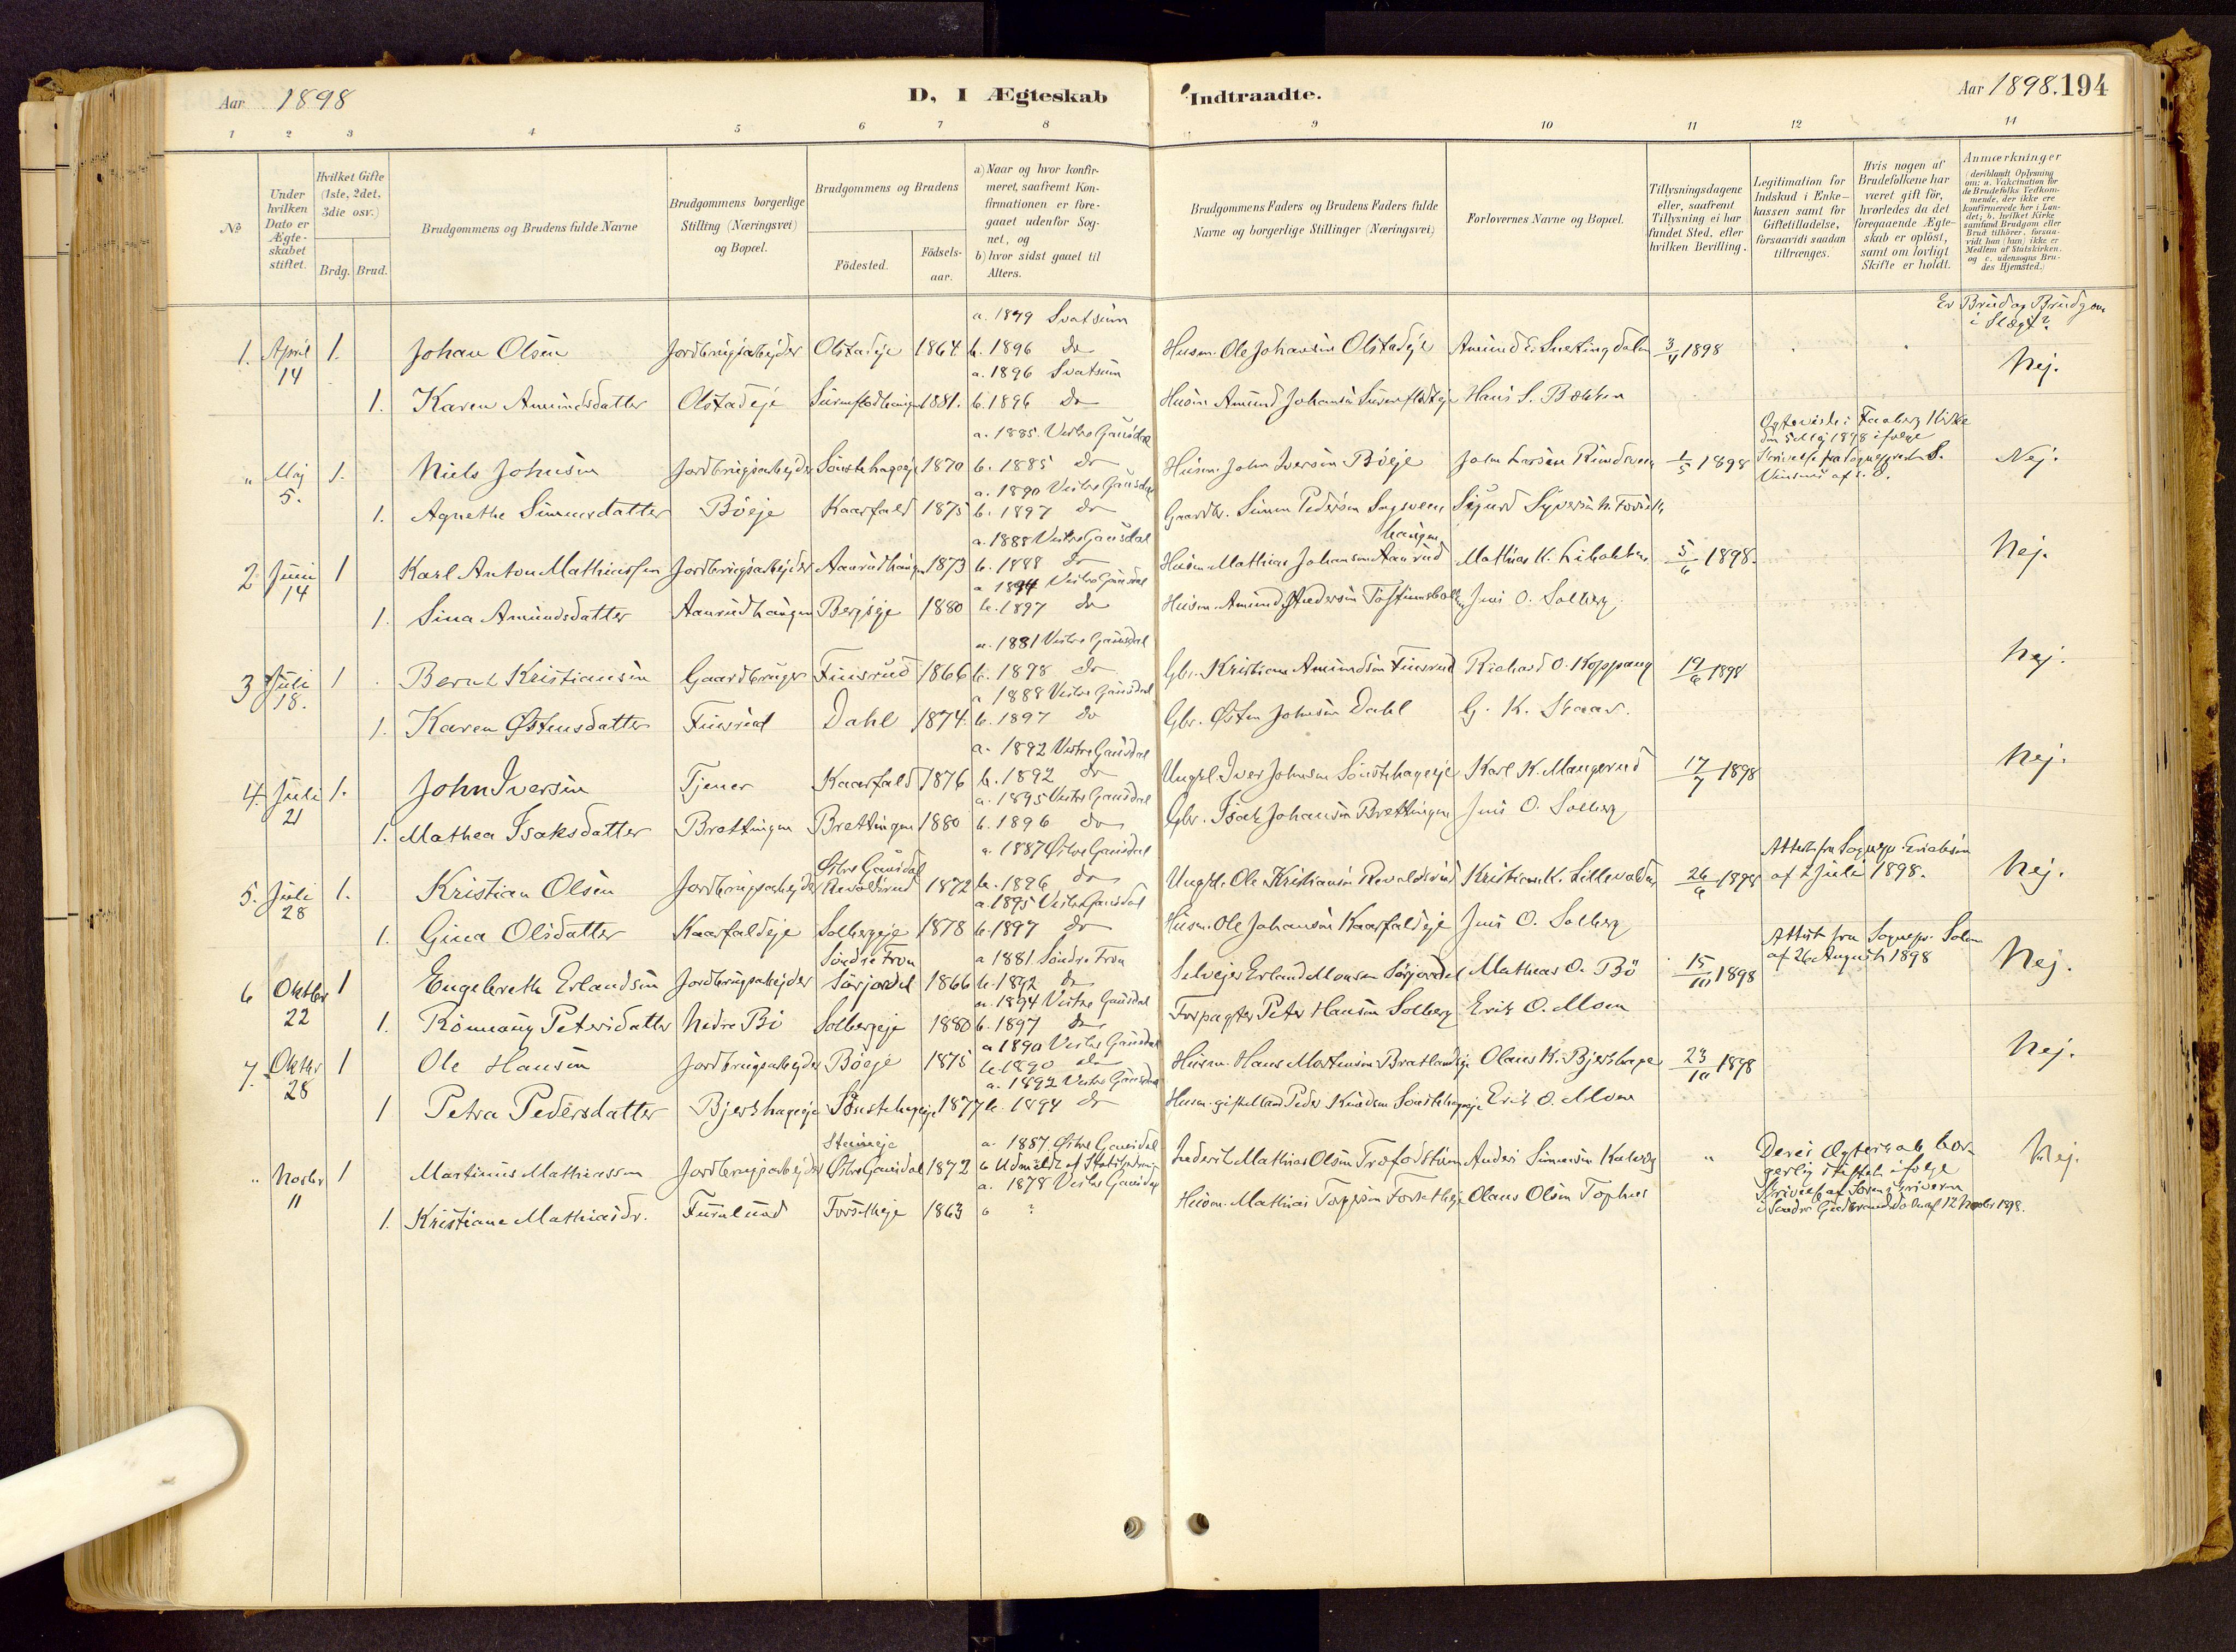 SAH, Vestre Gausdal prestekontor, Ministerialbok nr. 1, 1887-1914, s. 194